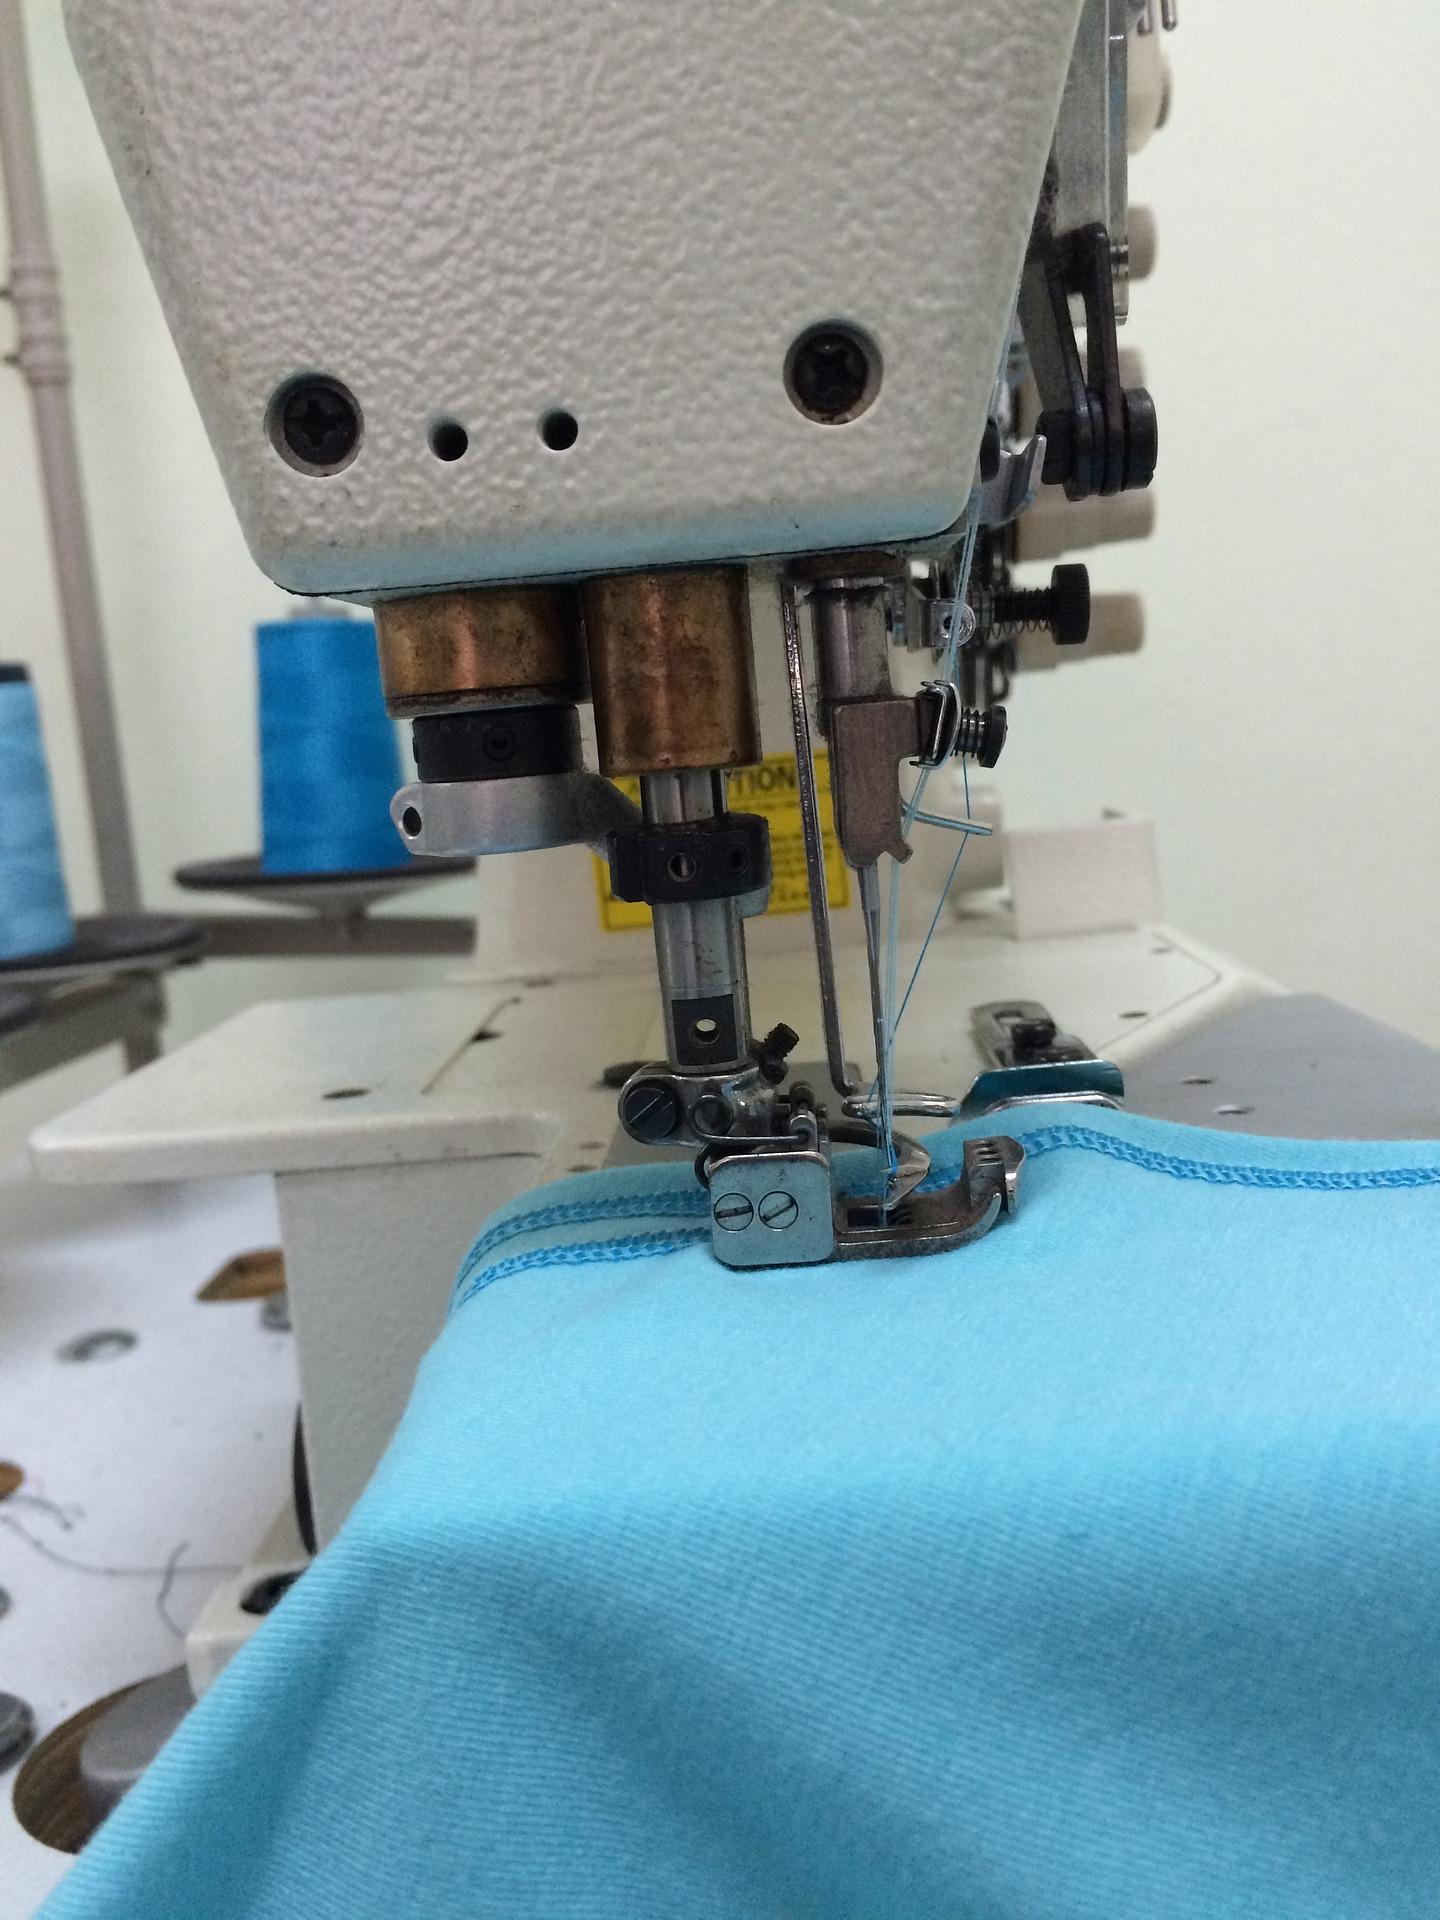 Learn to machine sew at the fleece mitten workshop.